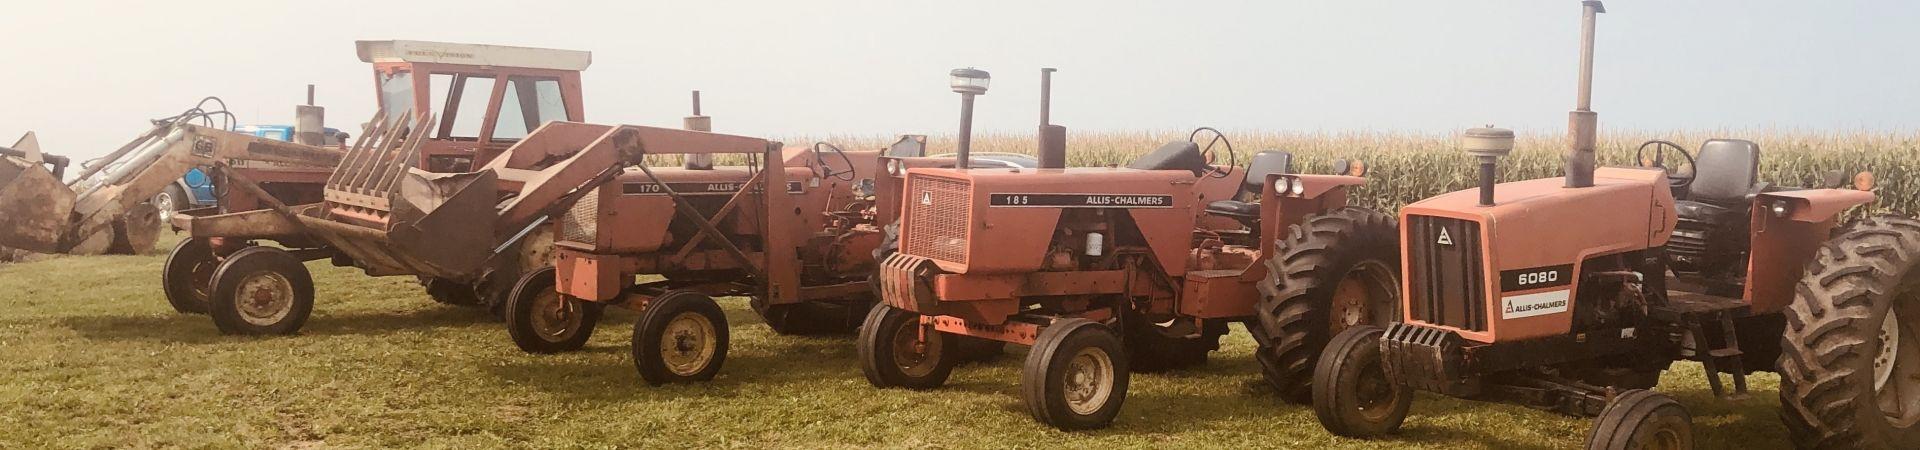 Img-6589